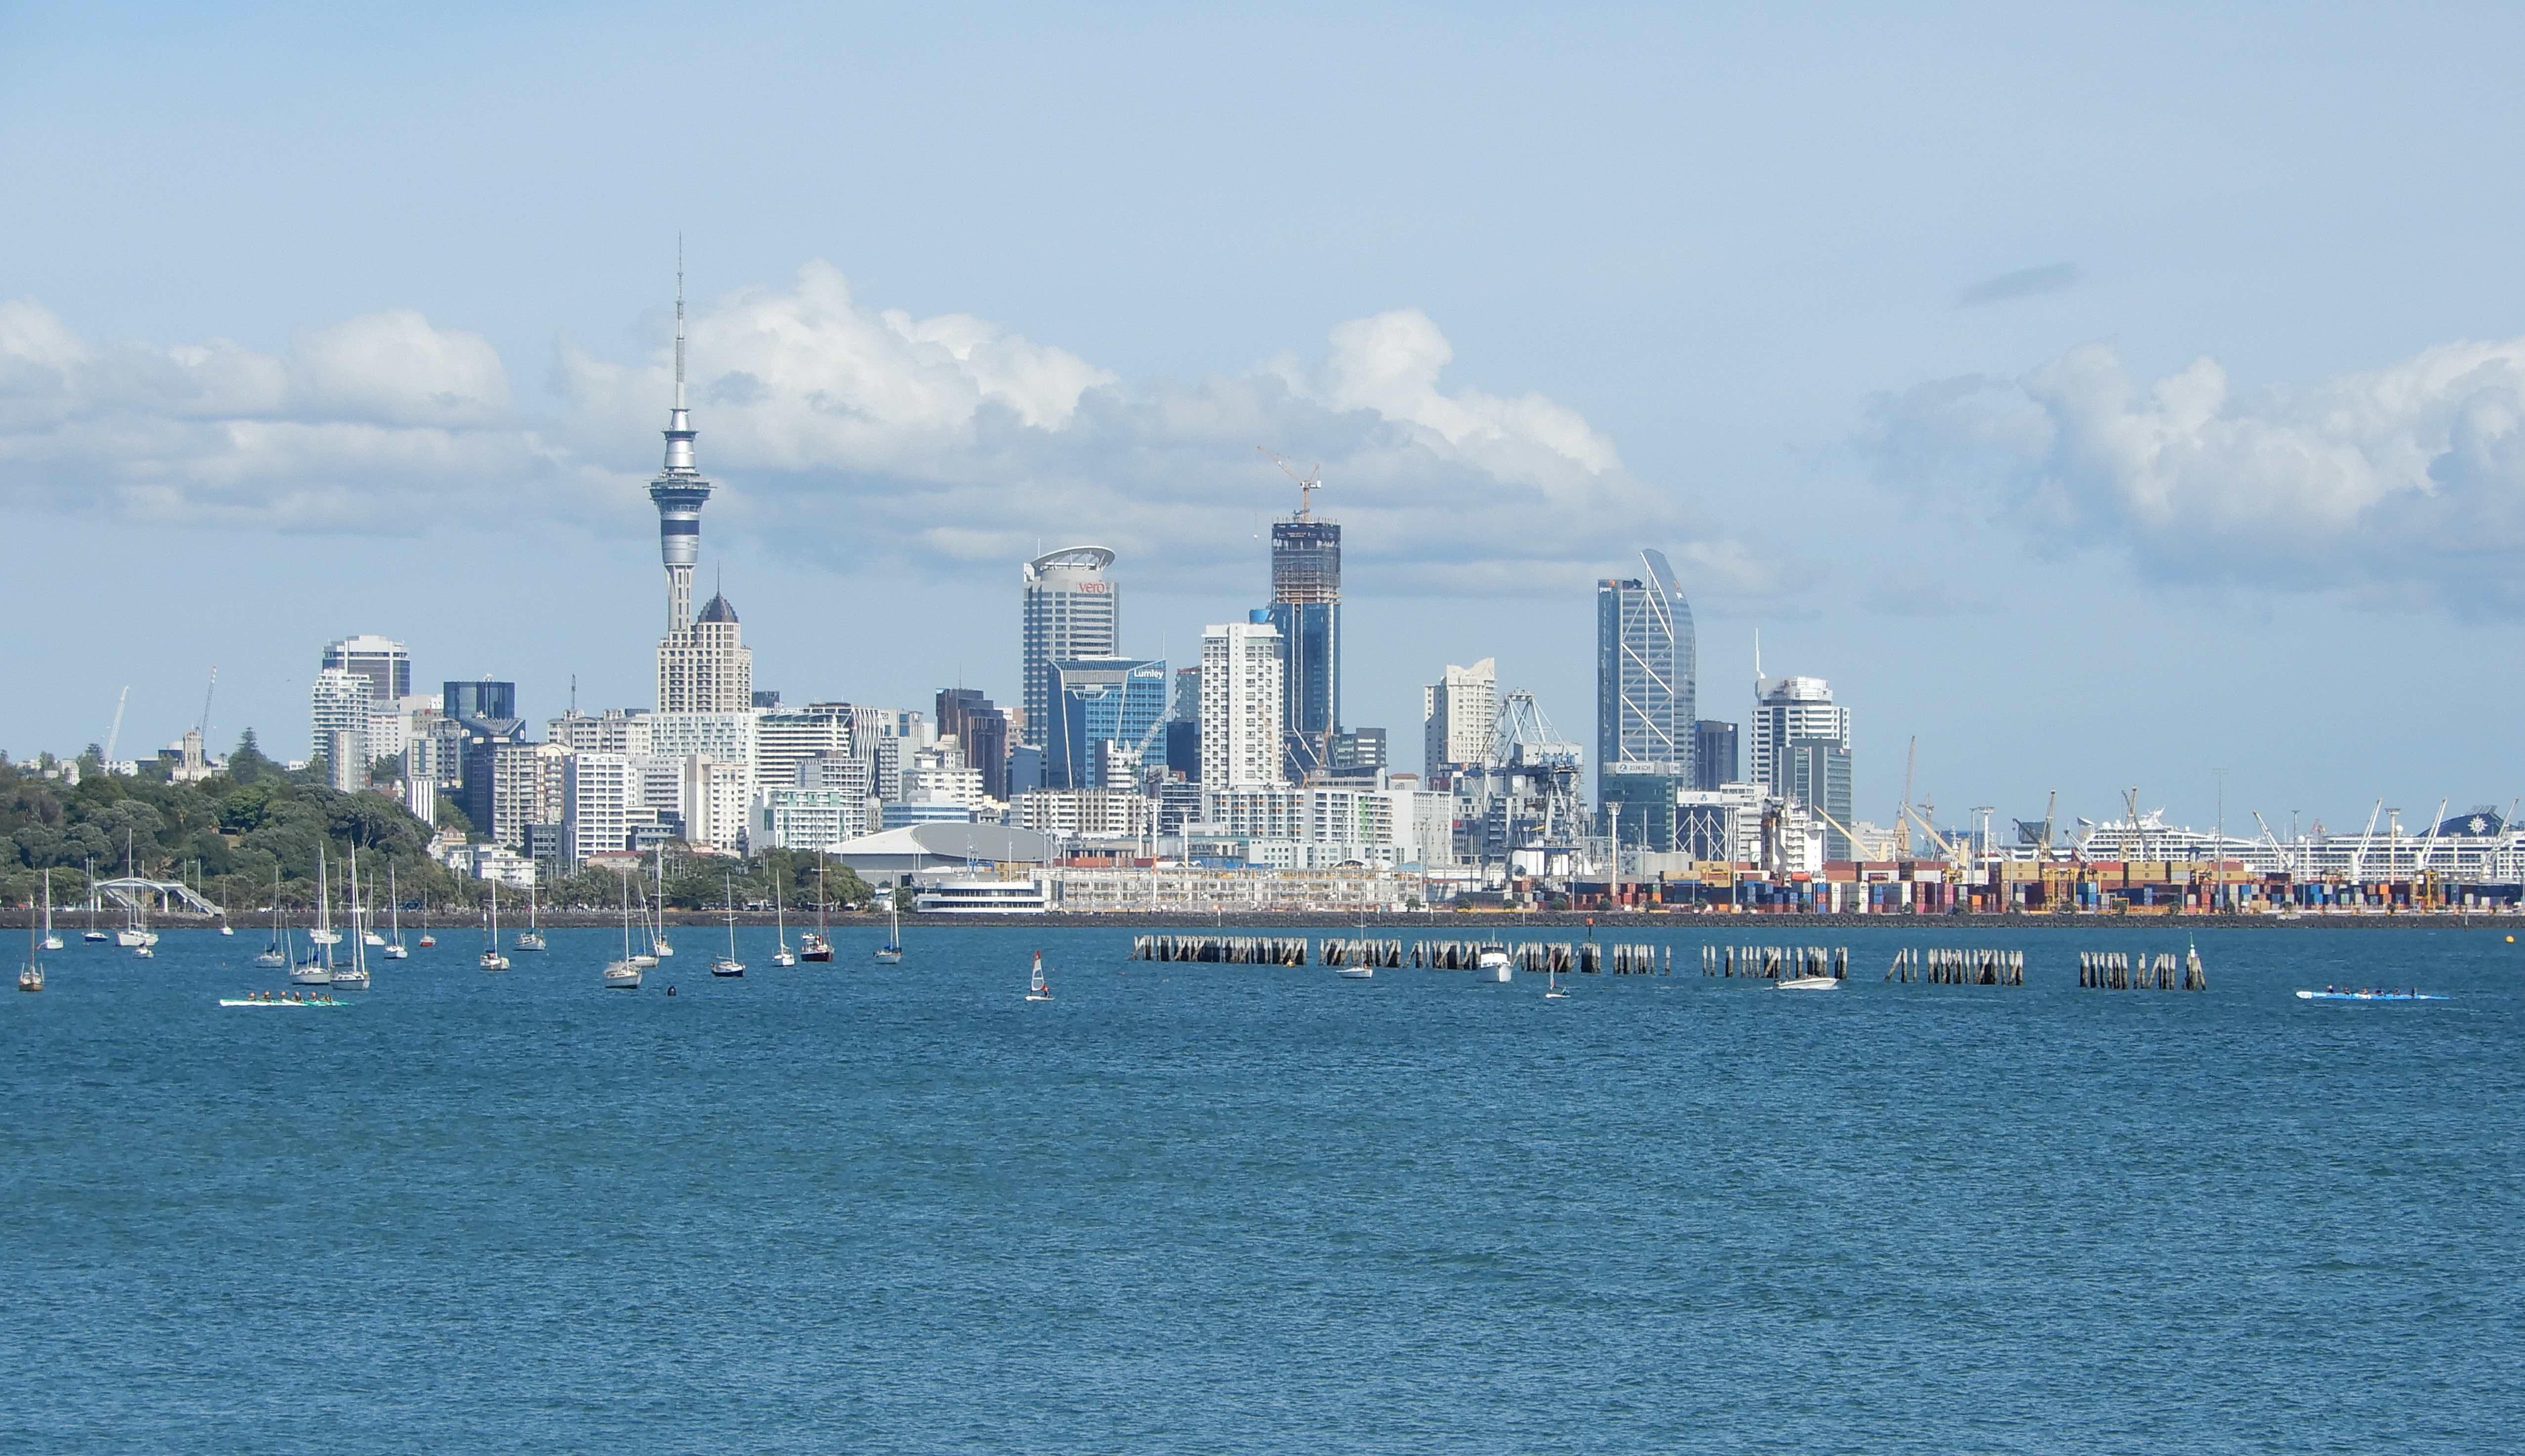 4.Auckland